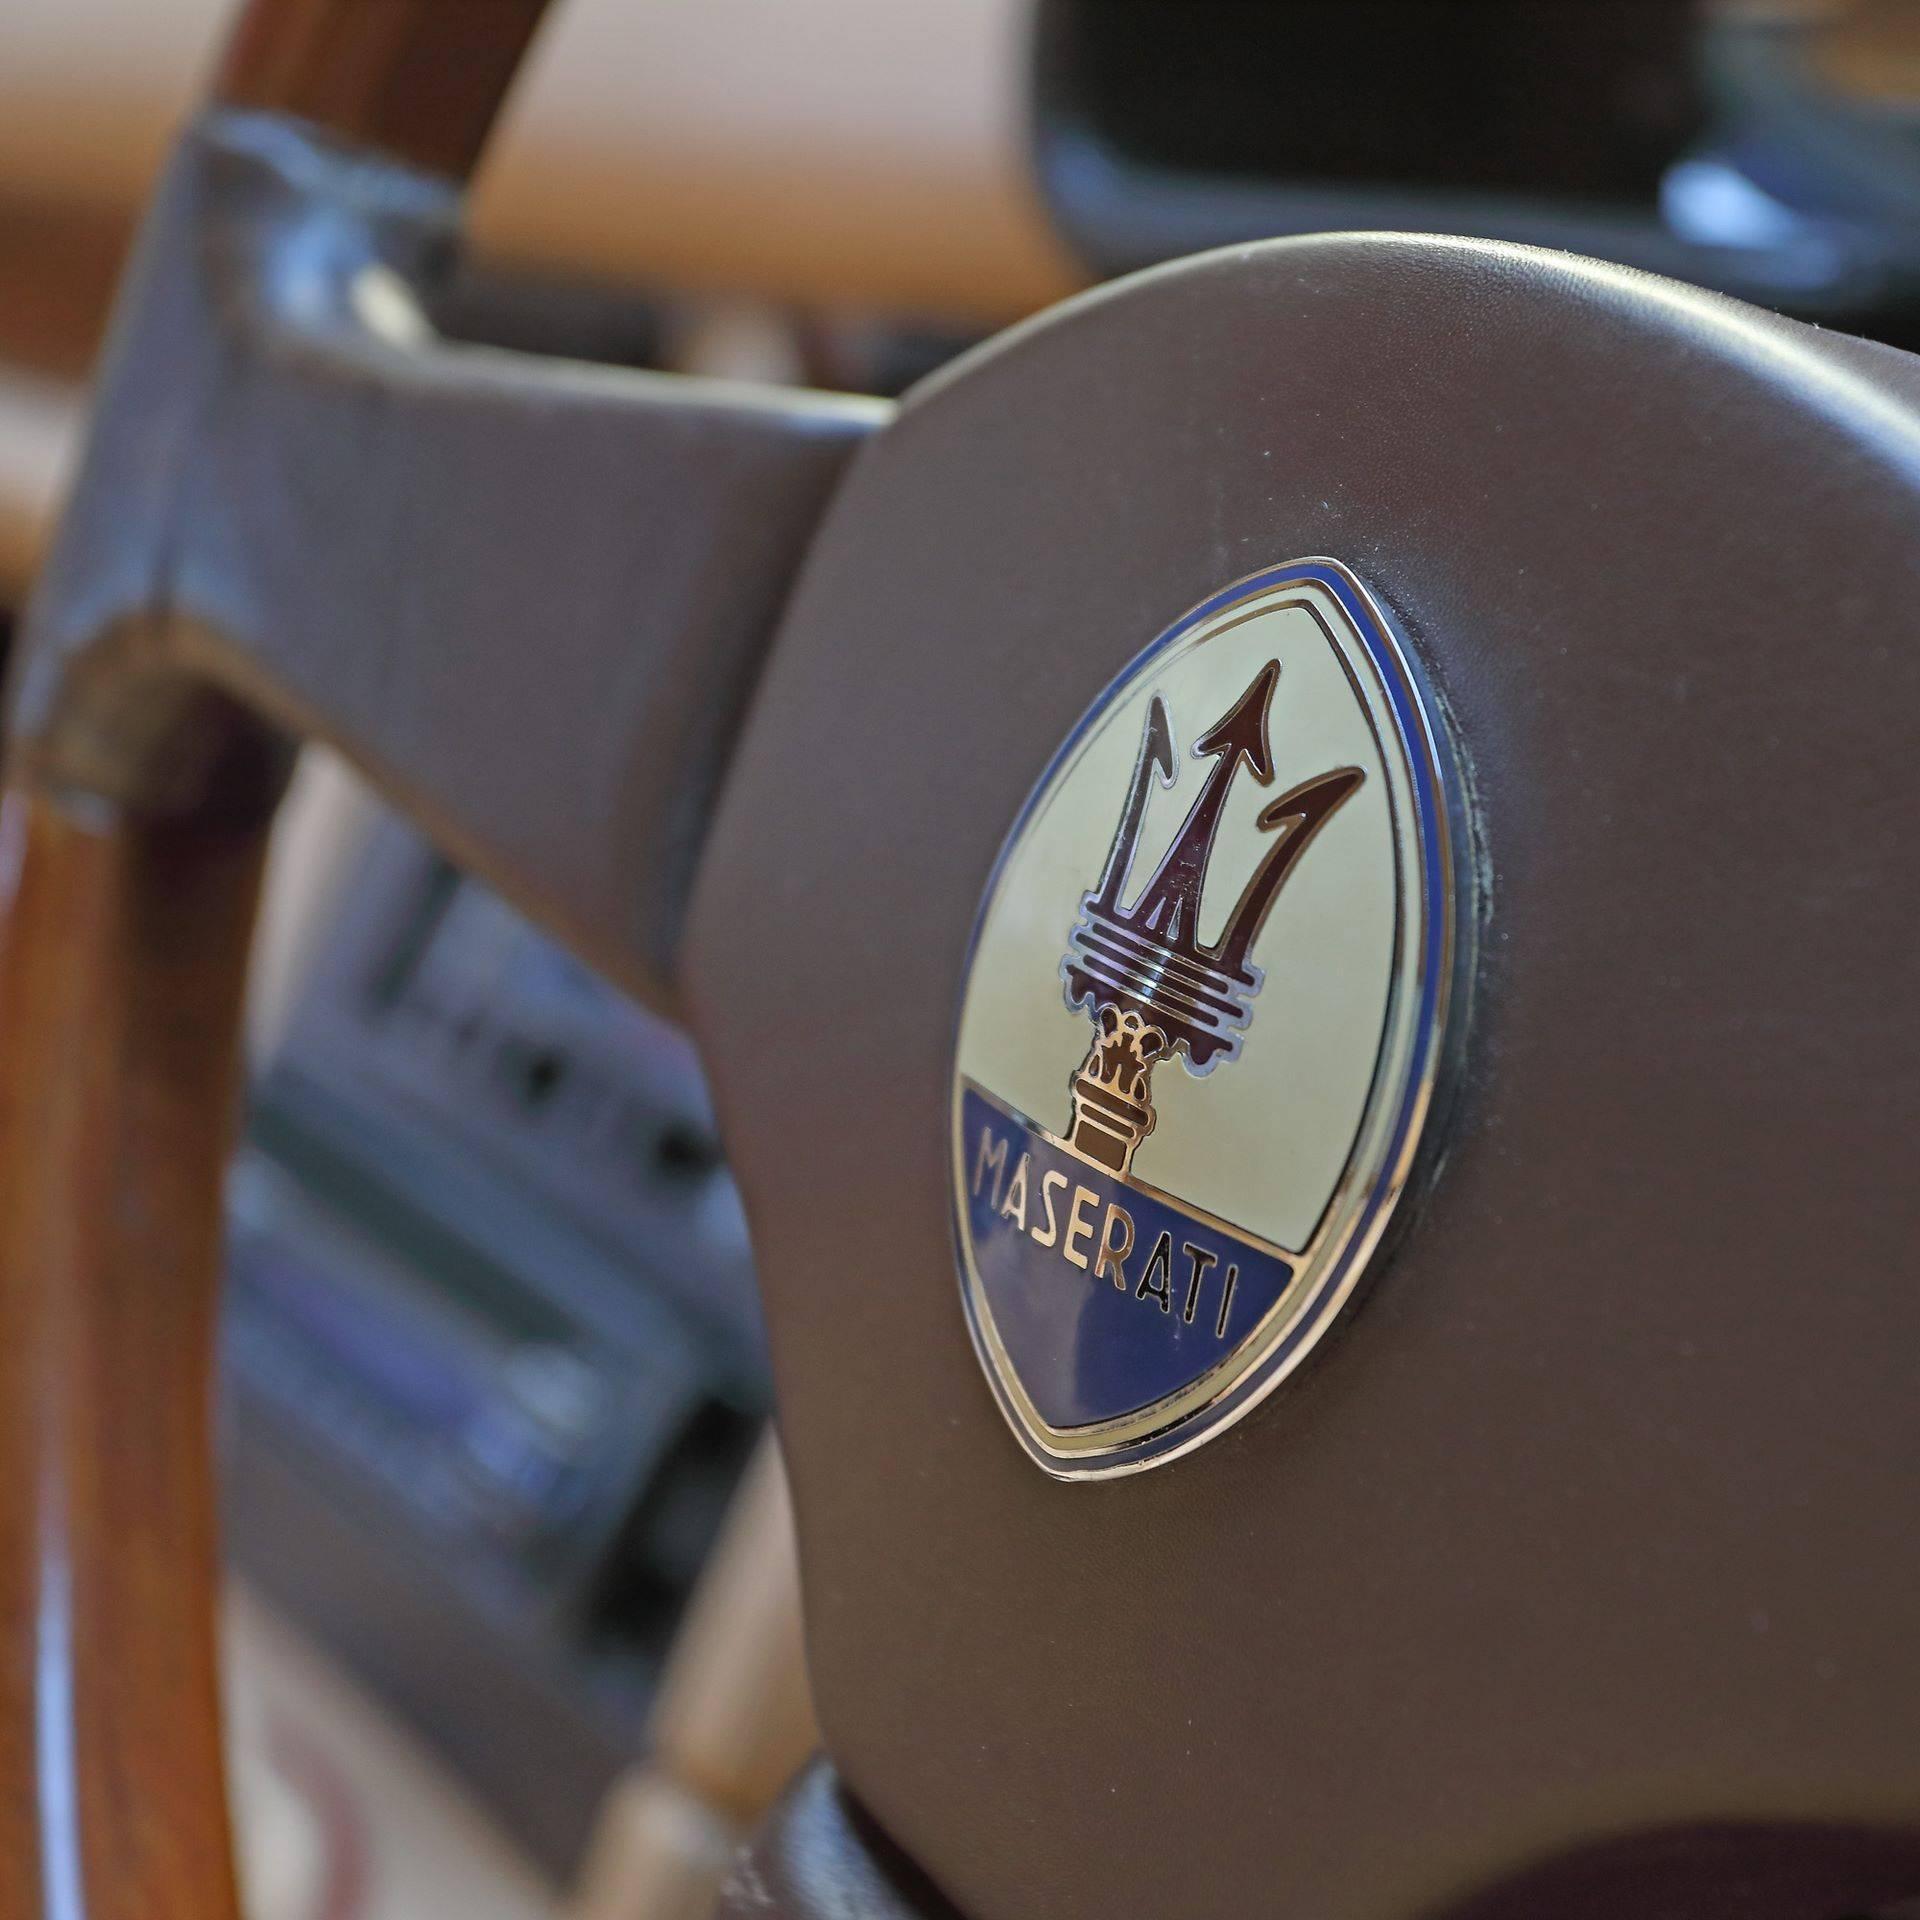 Maserati-Biturbo-Spyder-Elton-John-15